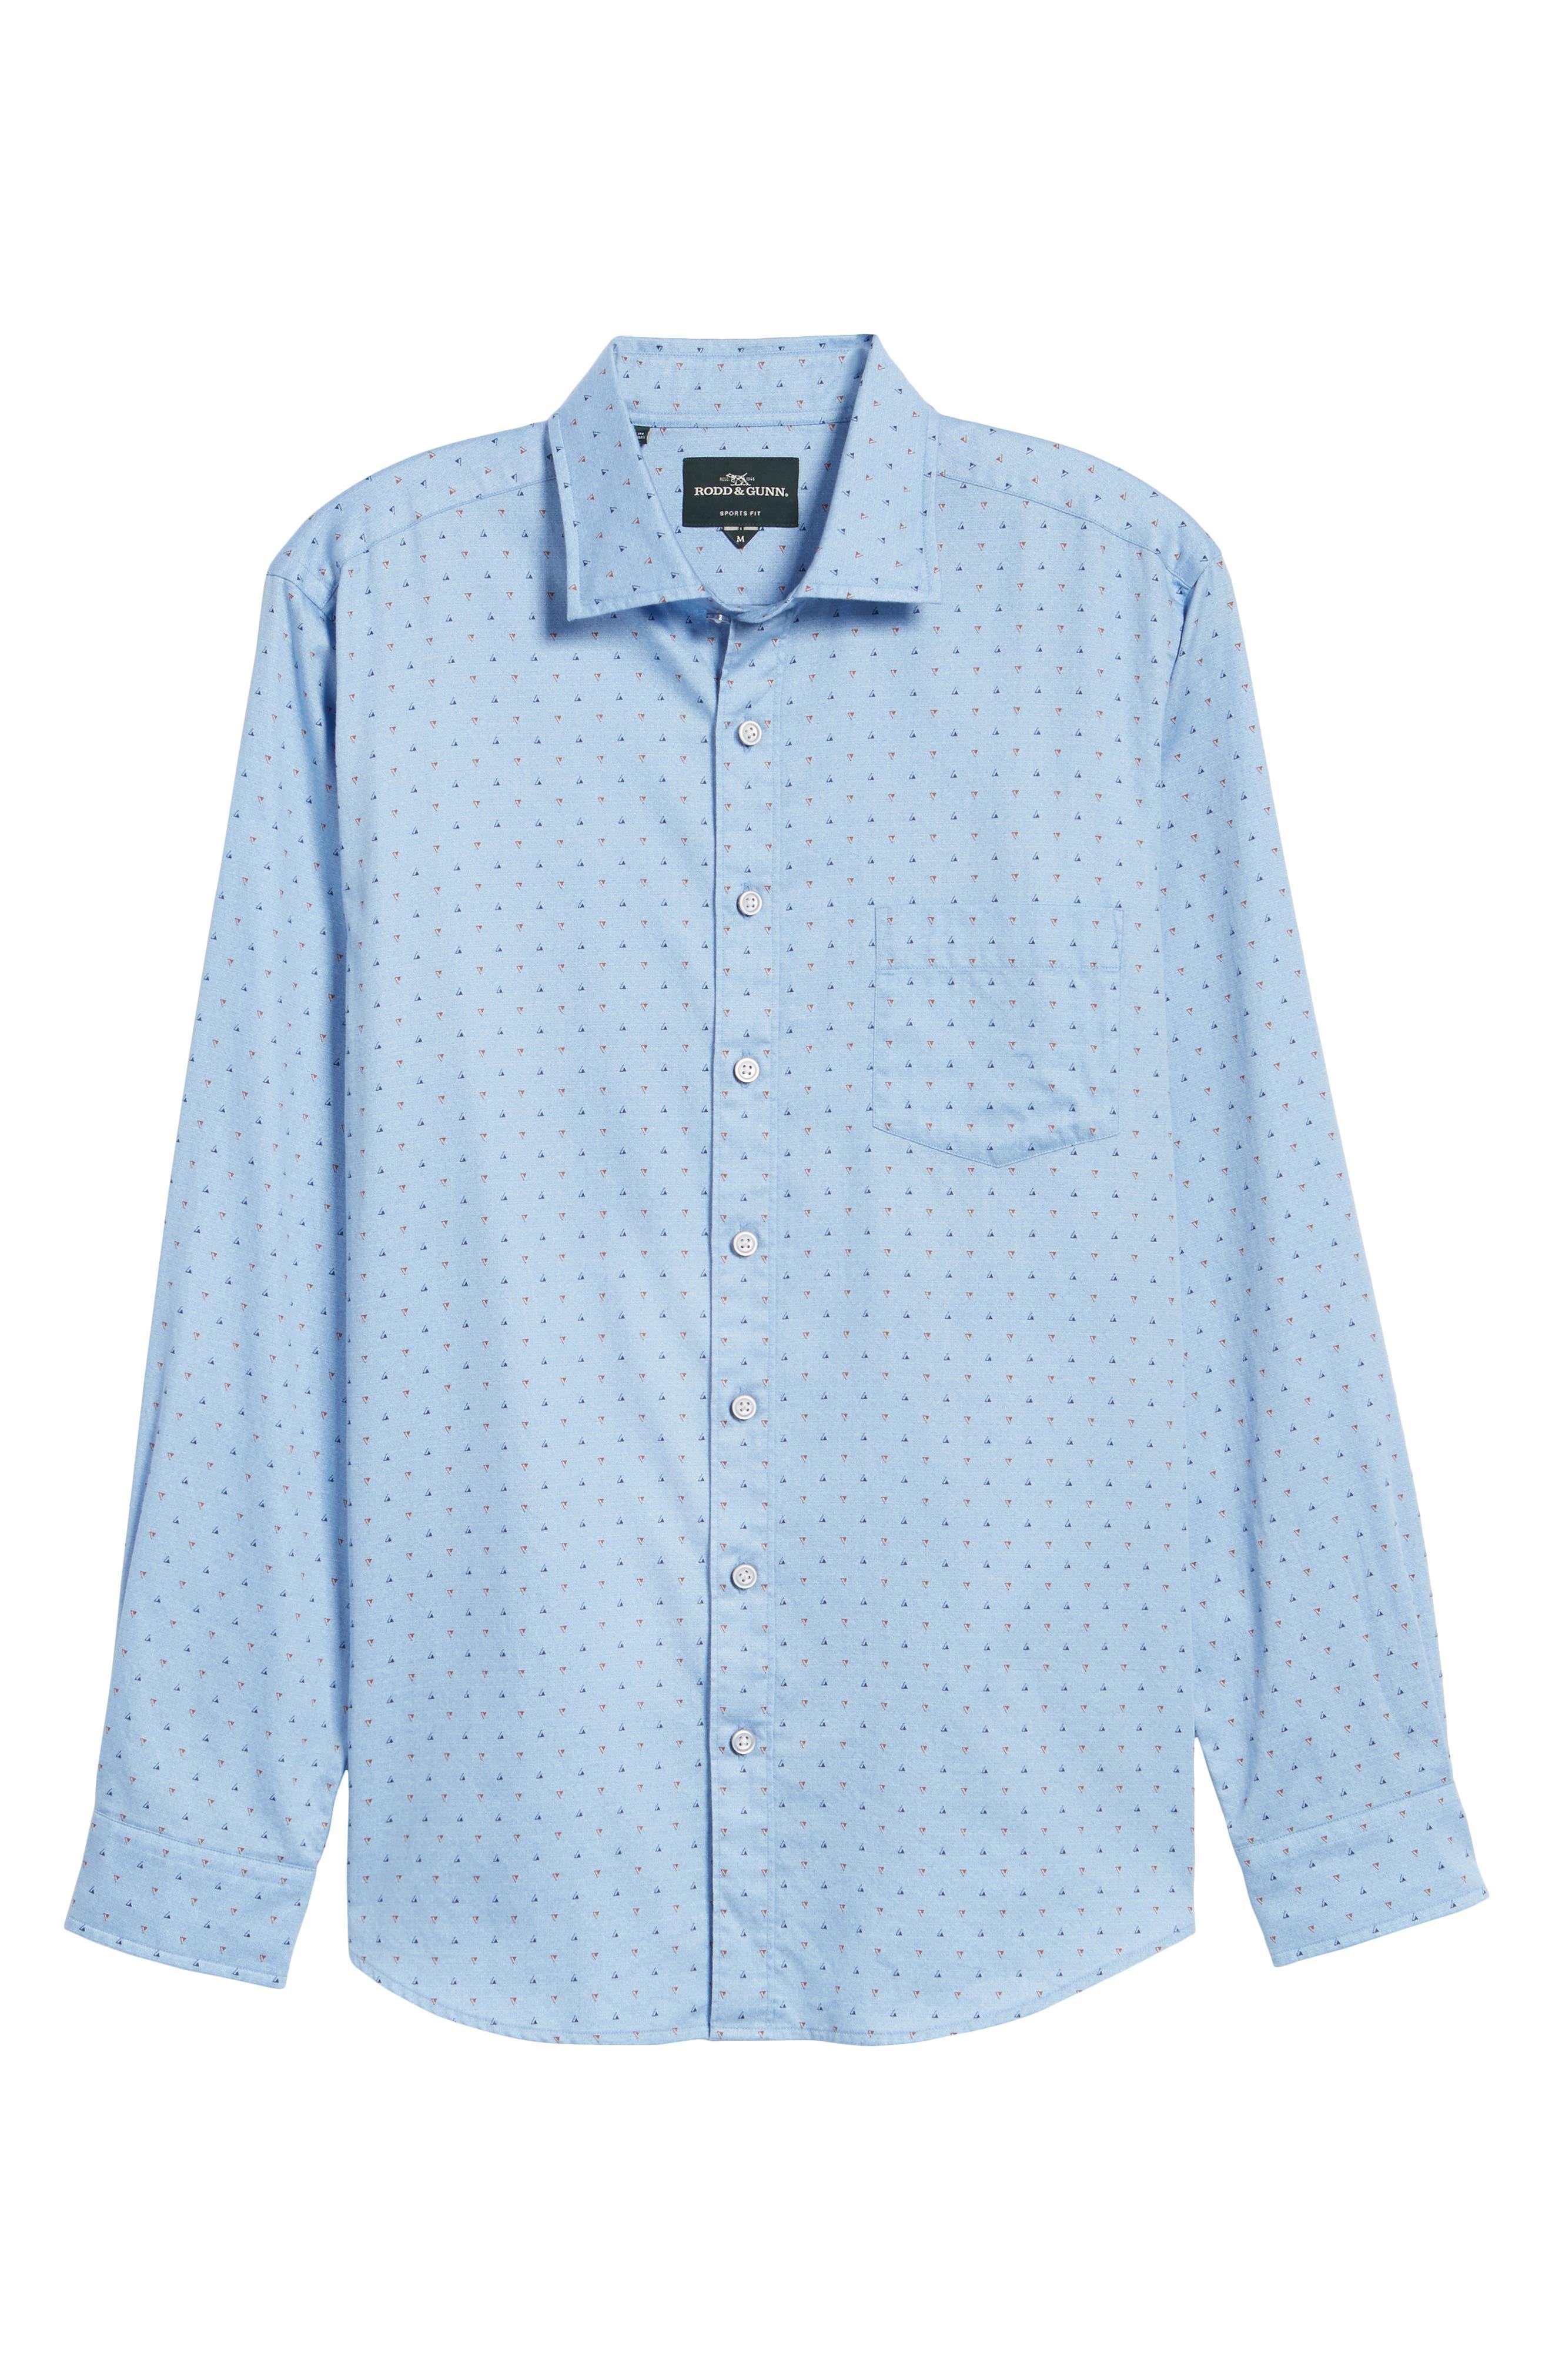 Penzance Regular Fit Sport Shirt,                             Alternate thumbnail 6, color,                             456